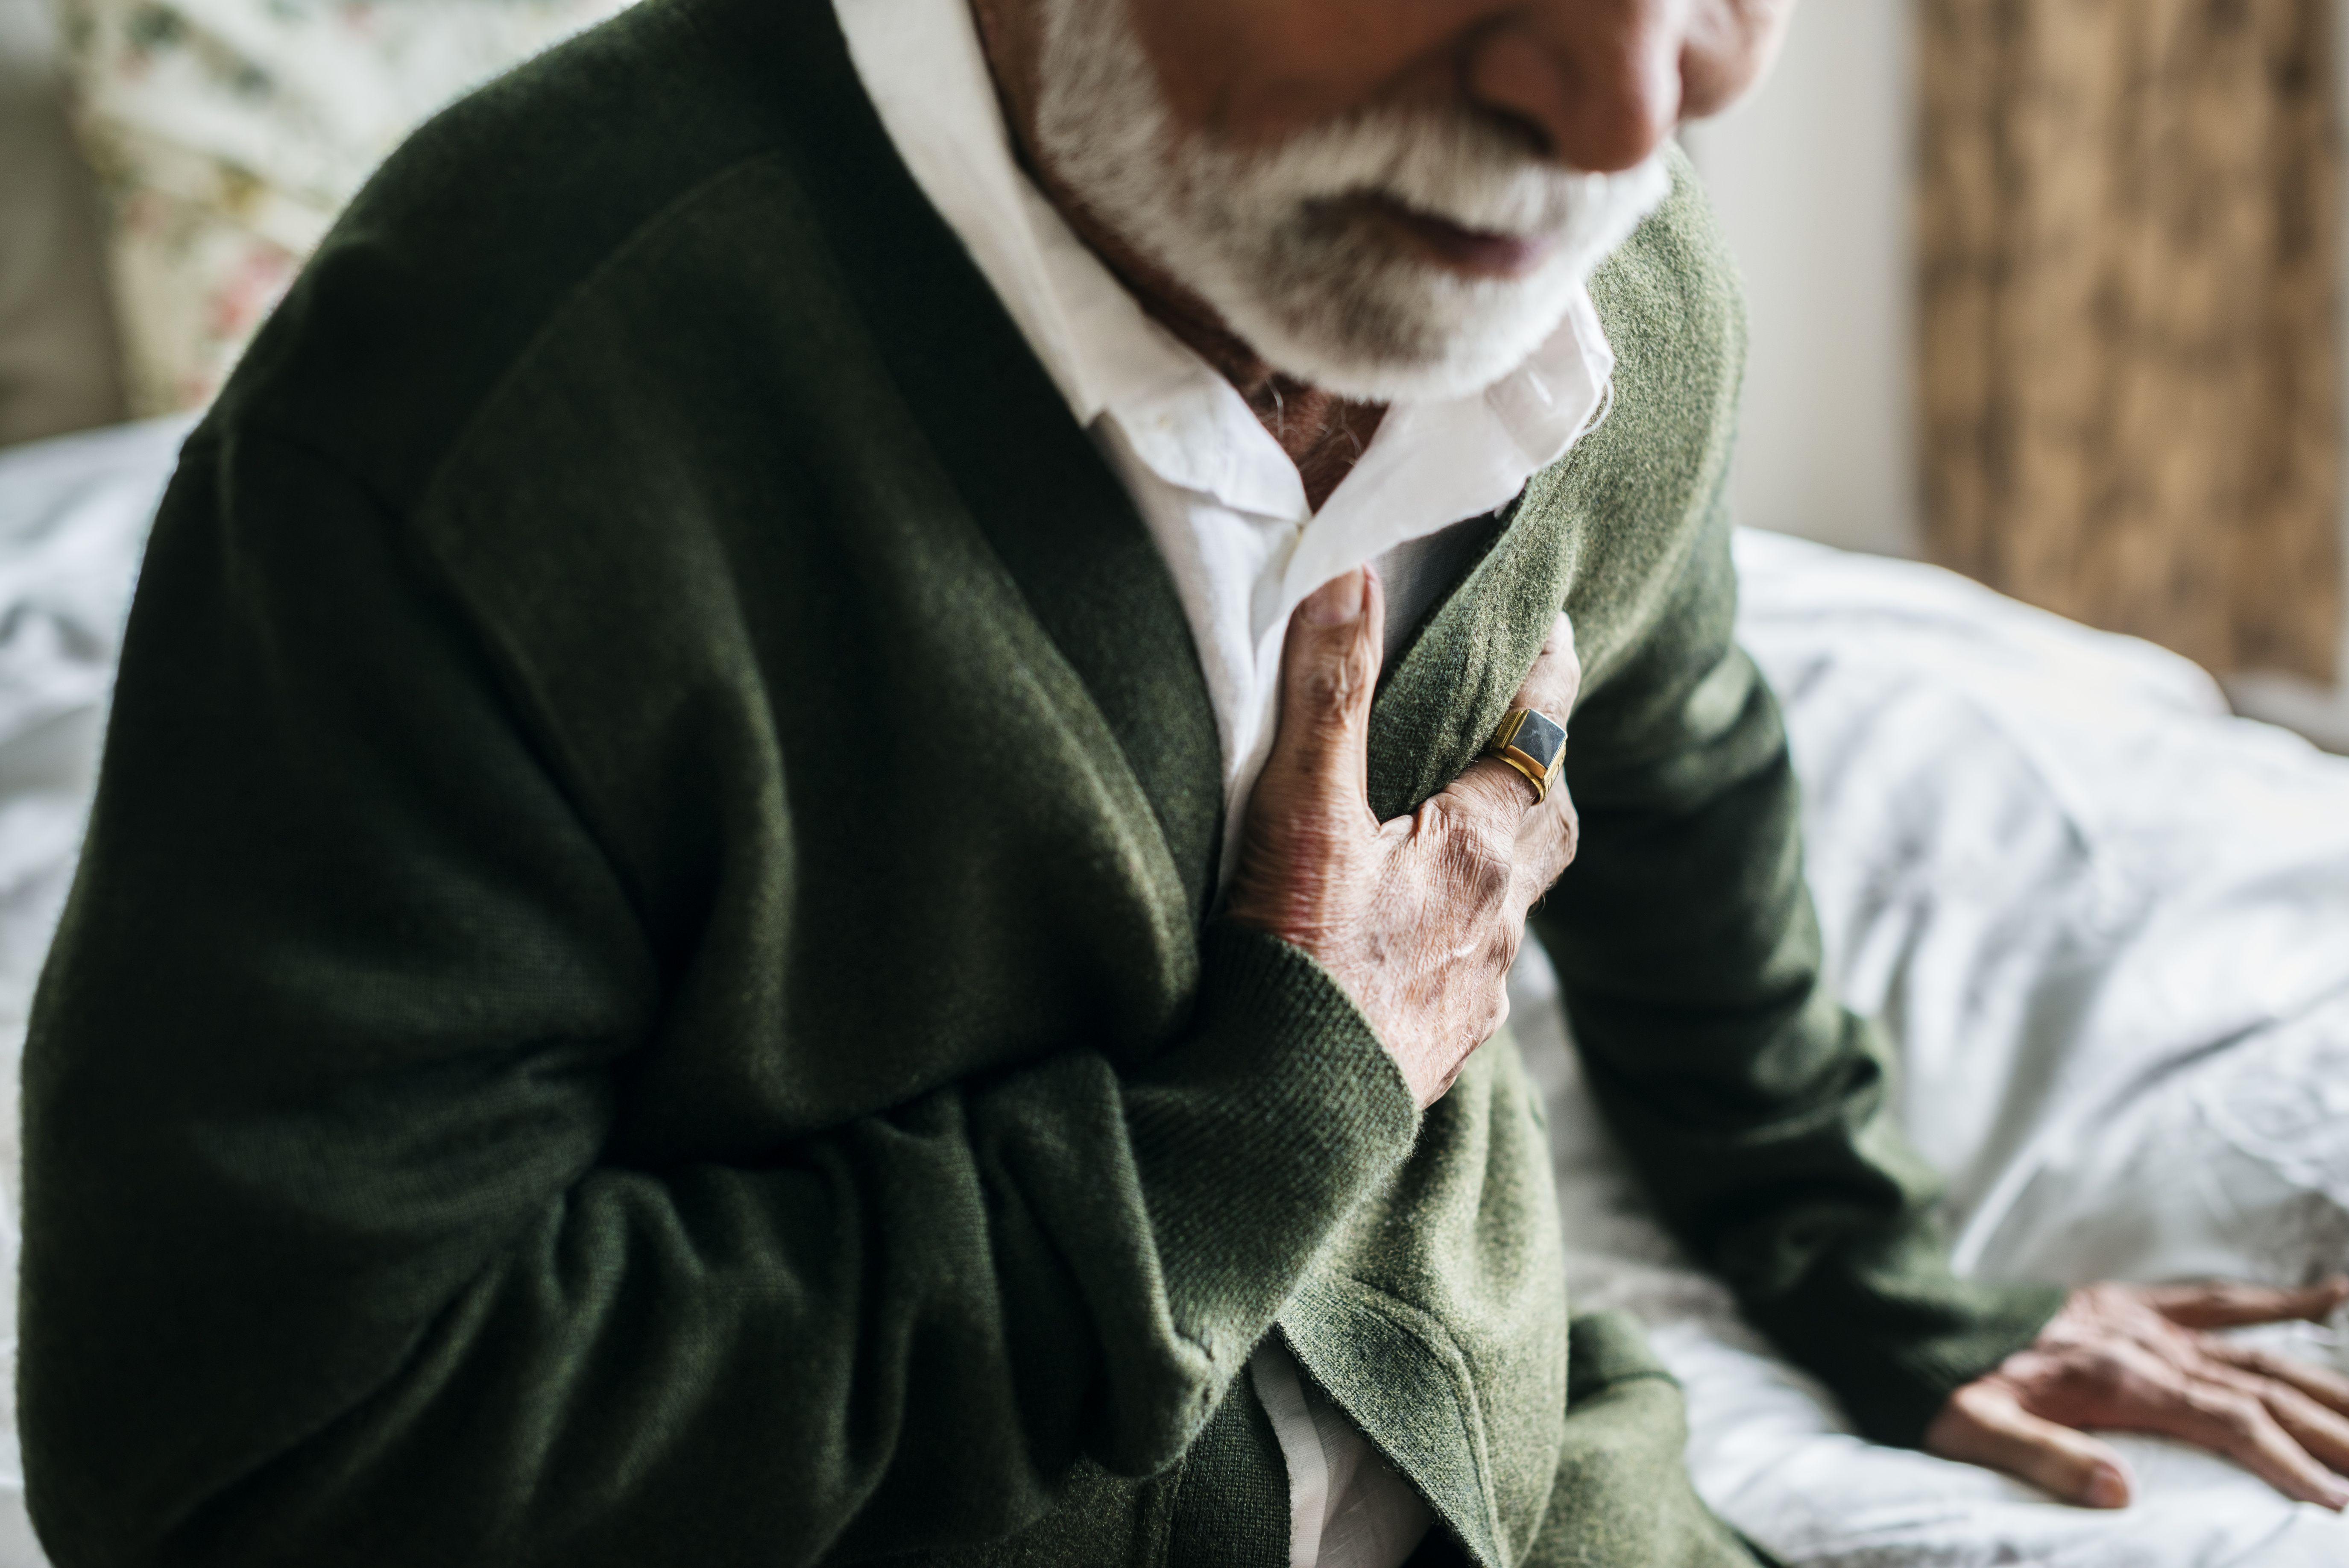 DMARD Treatment for Early RA Improves Heart Disease